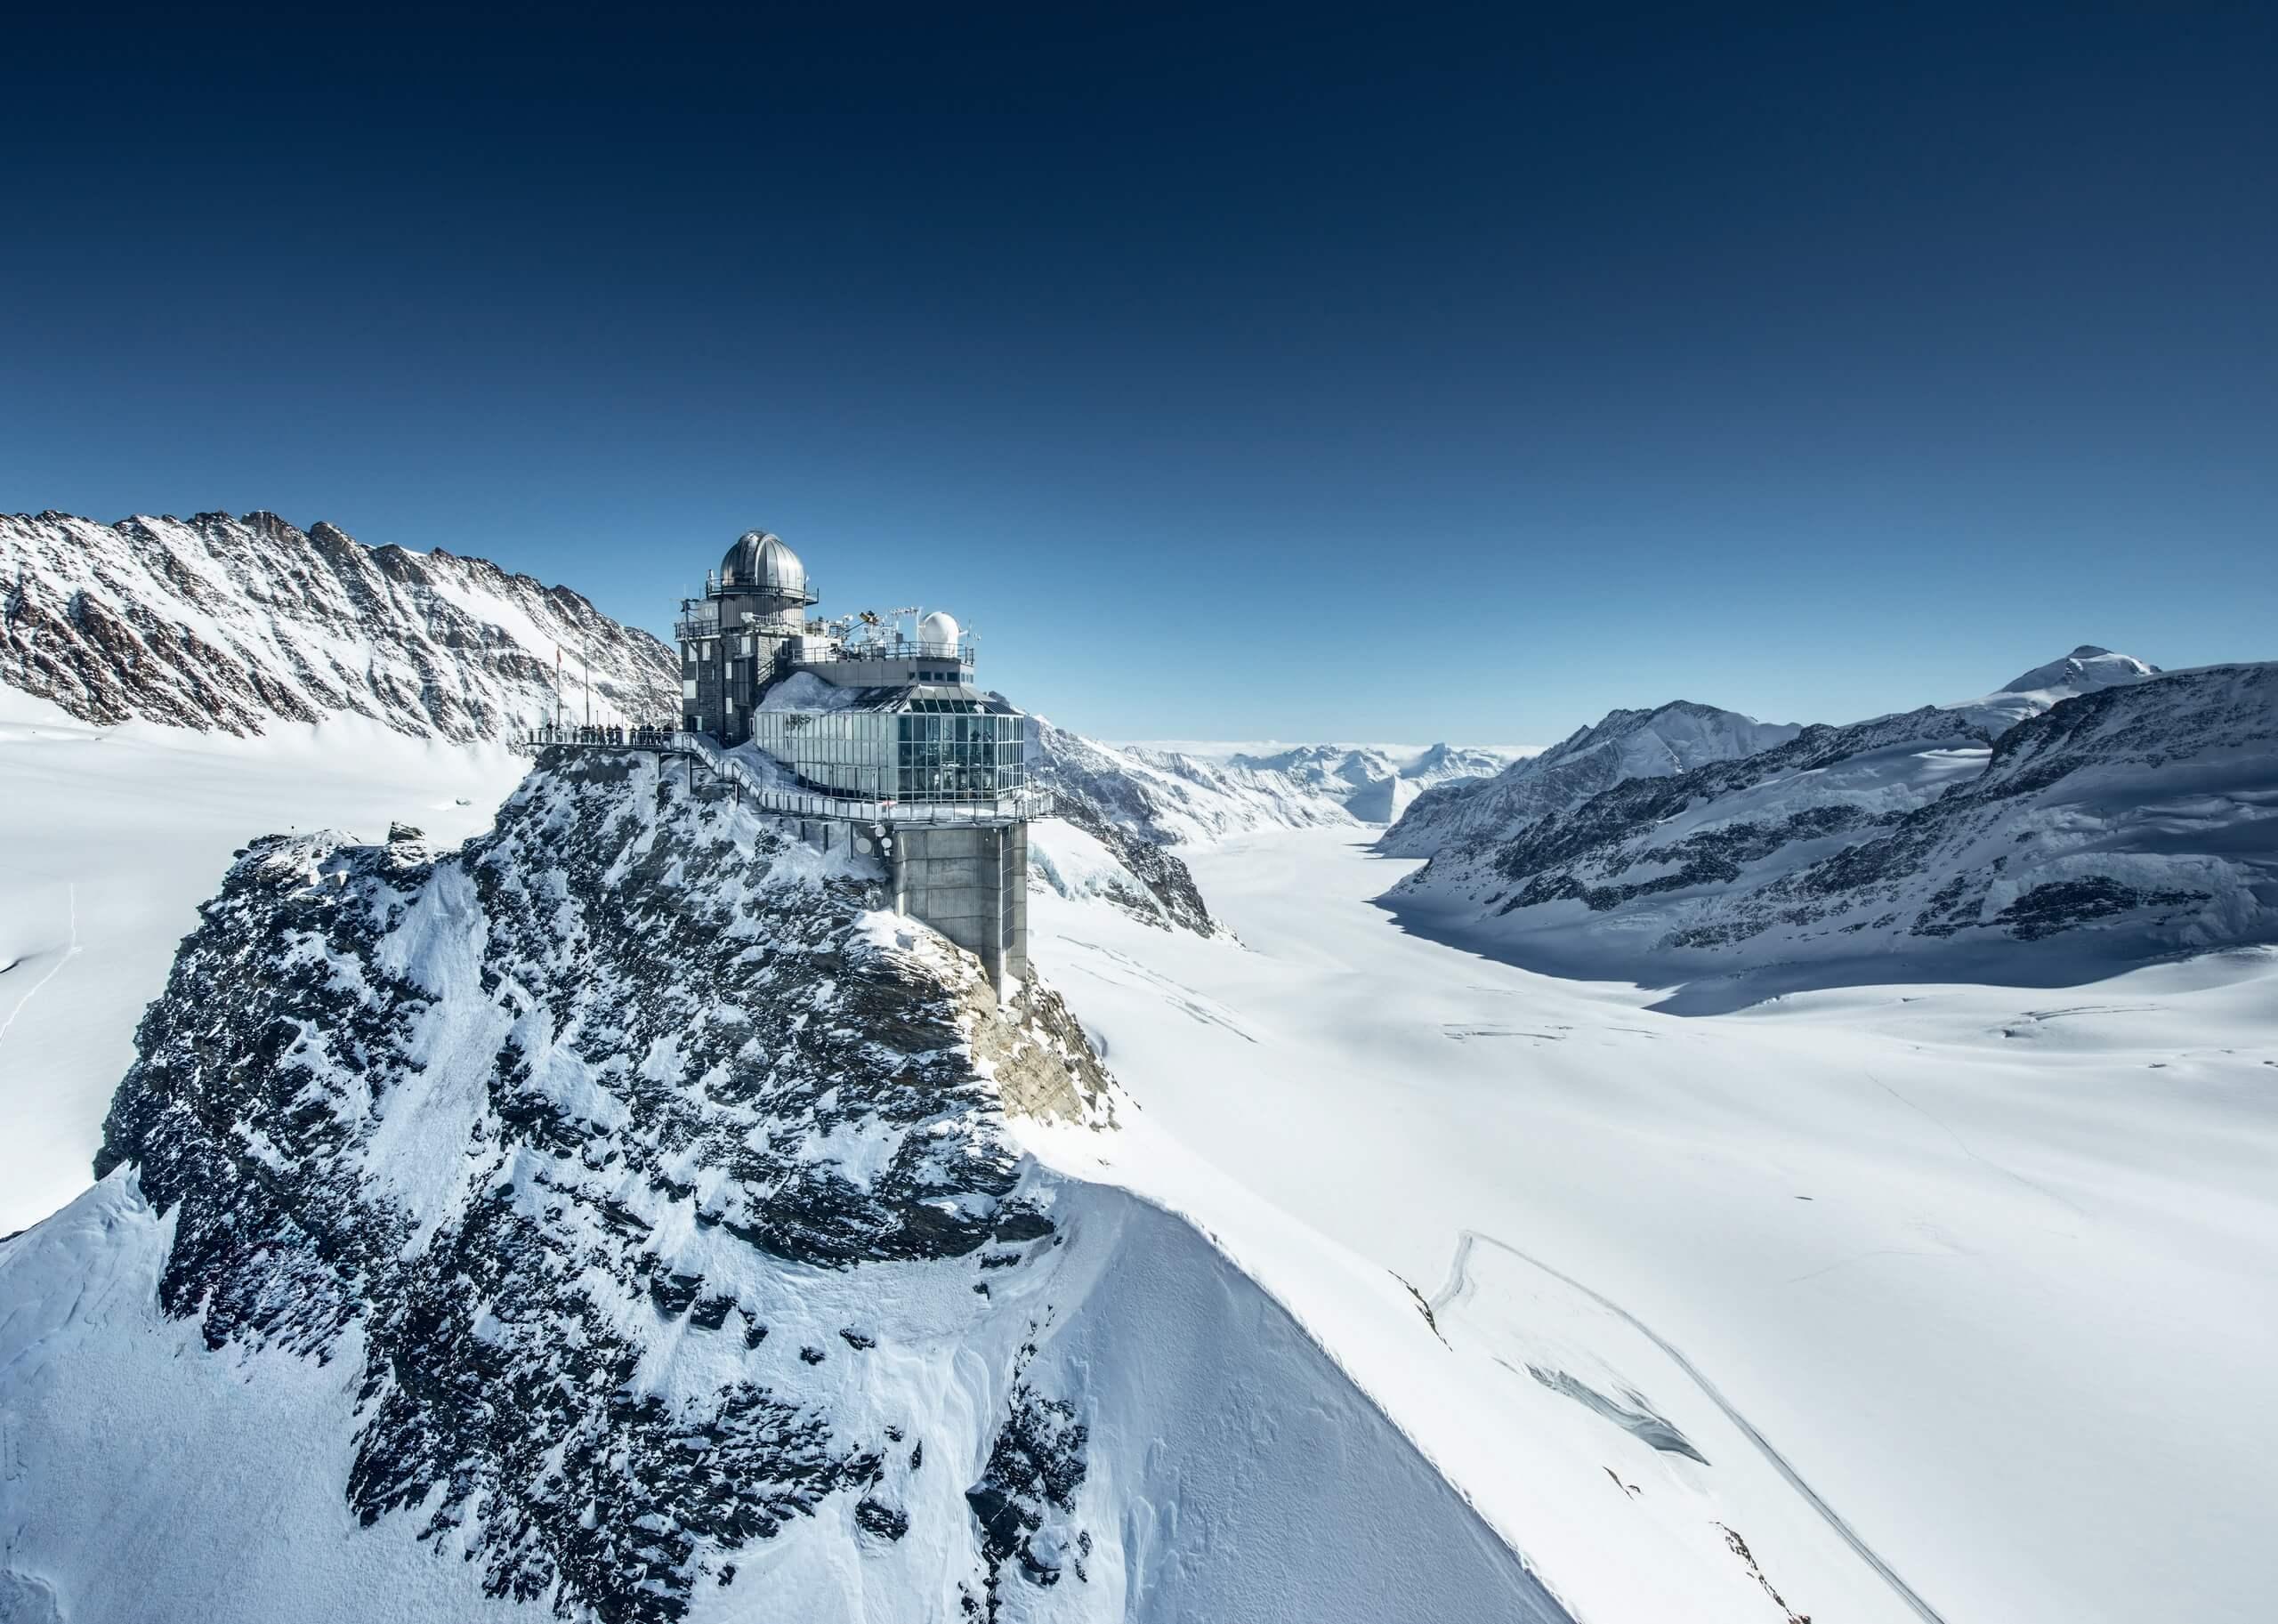 jungfraujoch-winter-dunkelblau-winterausfluege